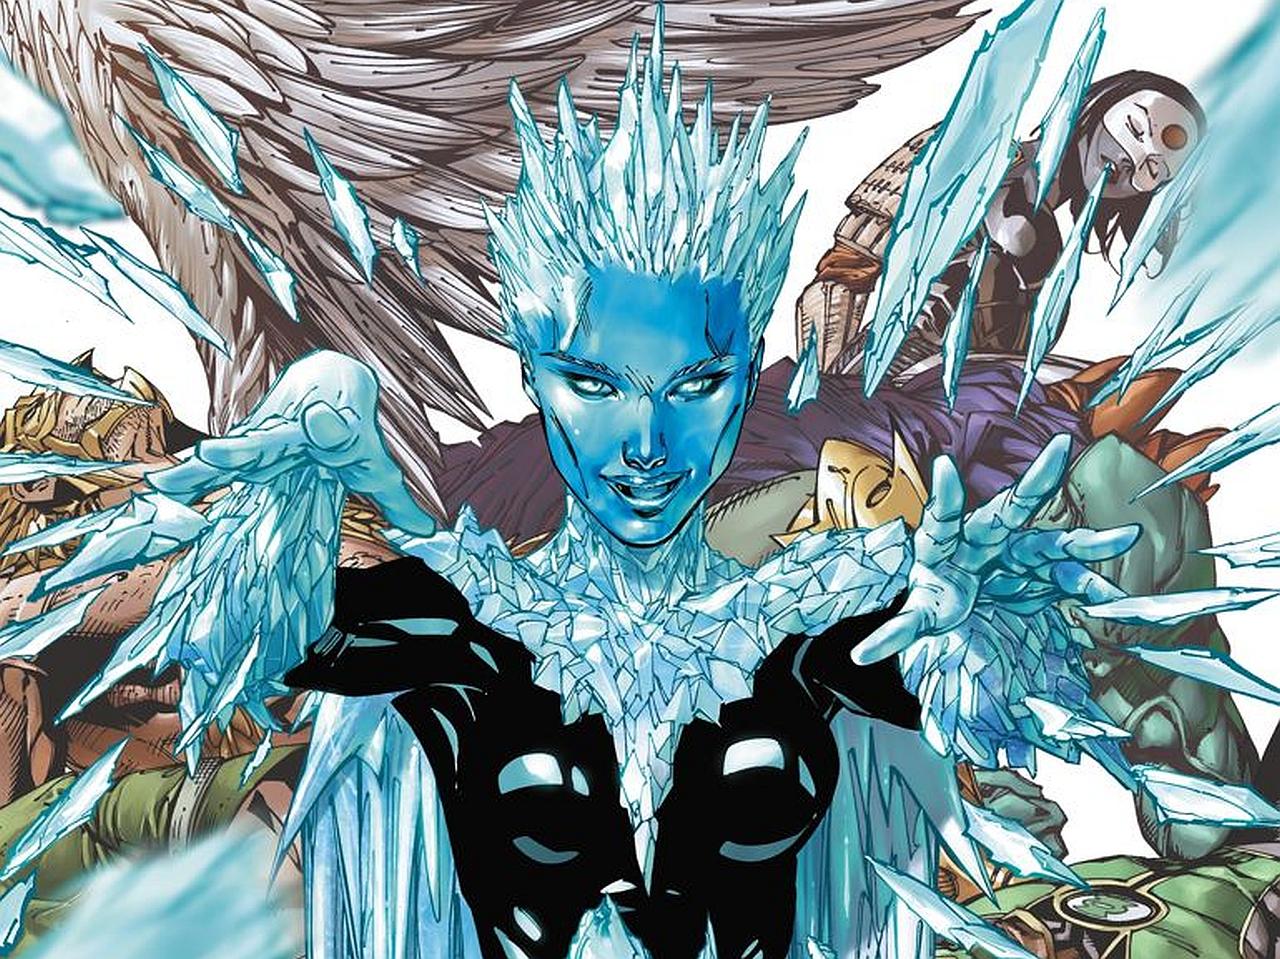 Injustice League Killer Frost by jsenior on DeviantArt |Young Justice Killer Frost